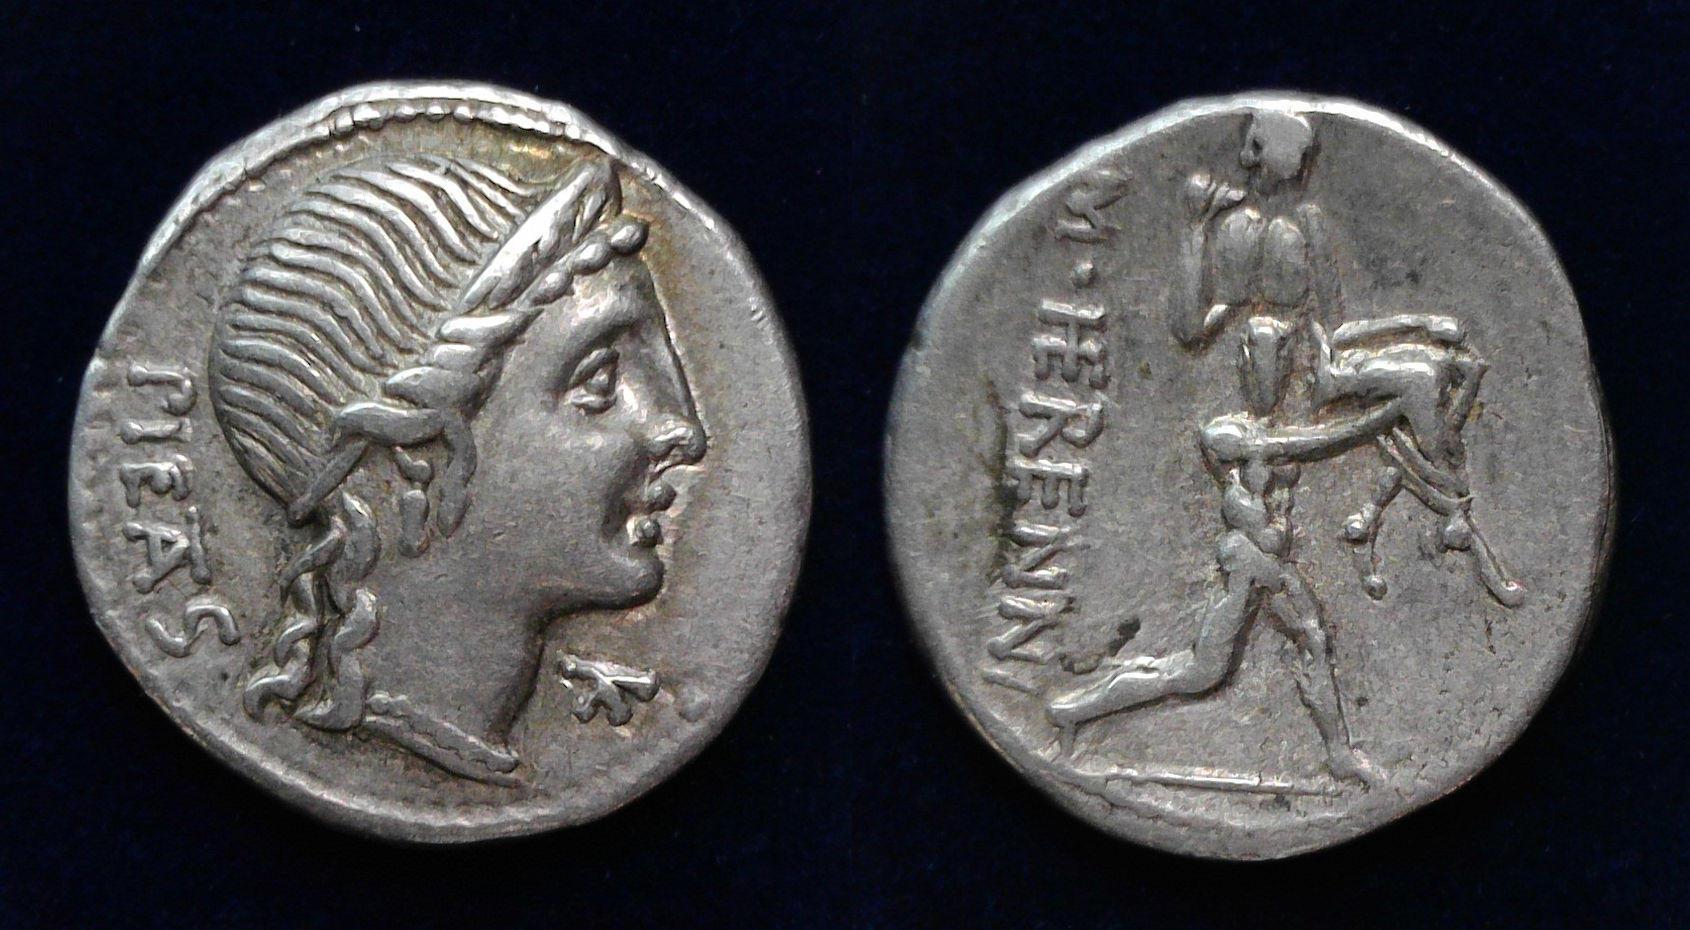 M. Herennius, 108-107 BC, C. 308/1a